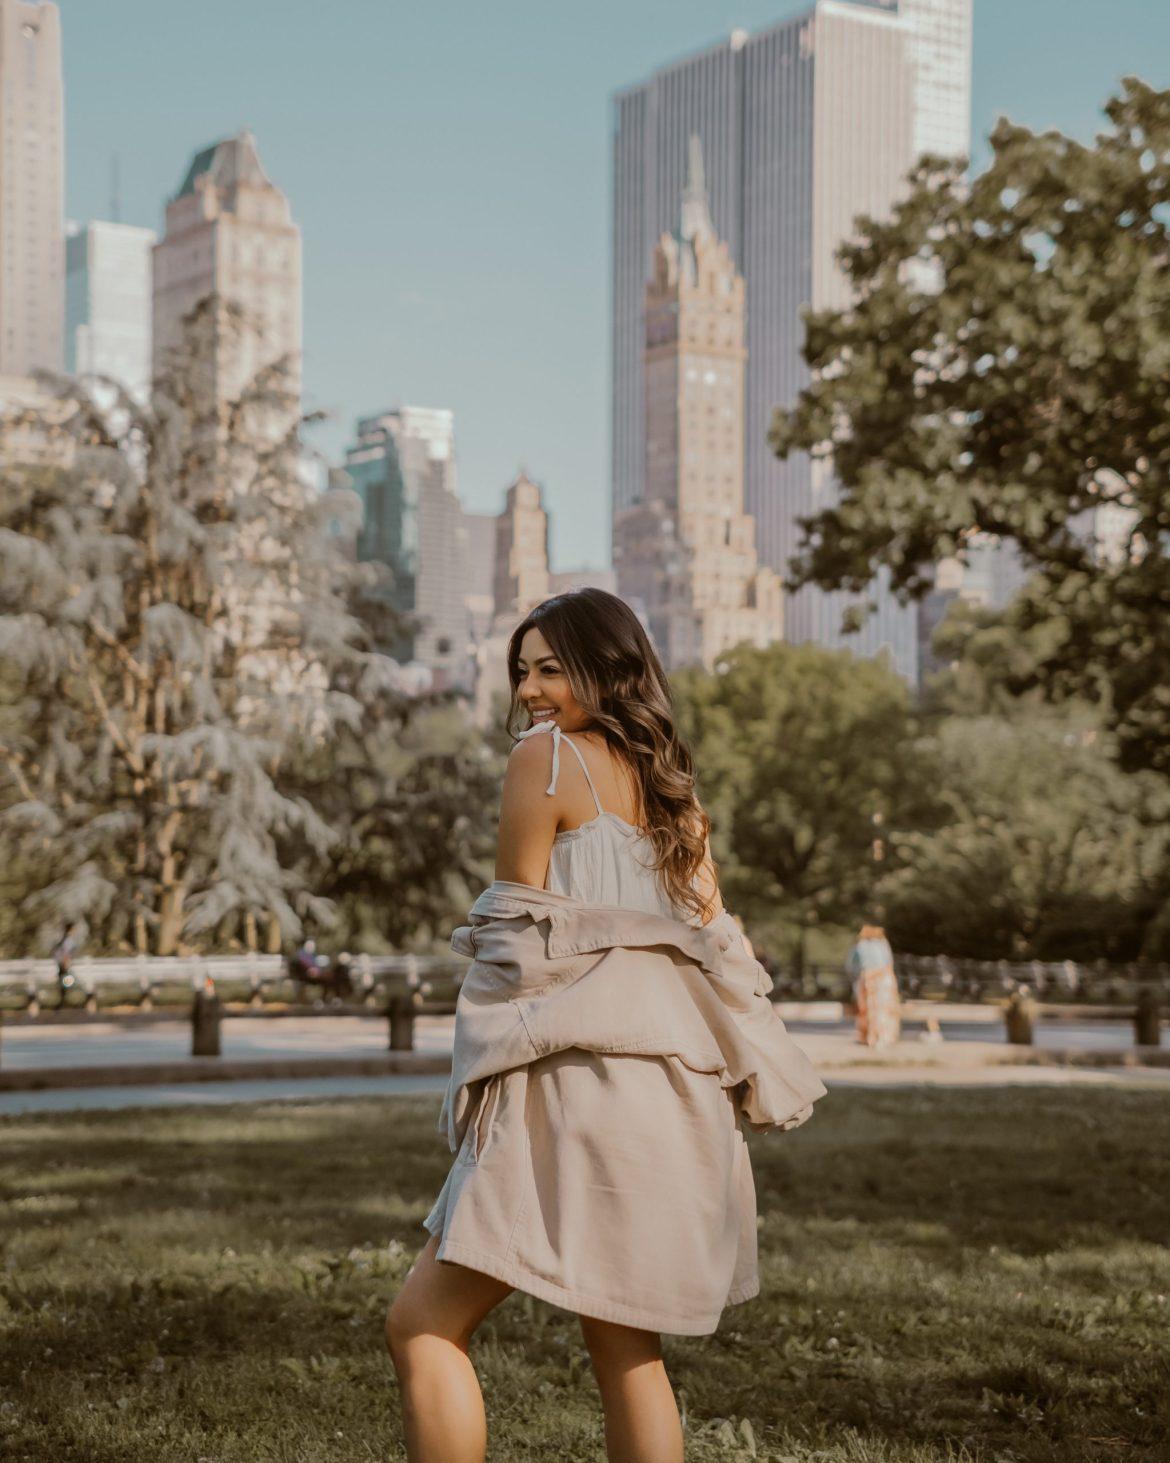 17 Best Instagram Worthy Spots in New York | Central Park photoshoot